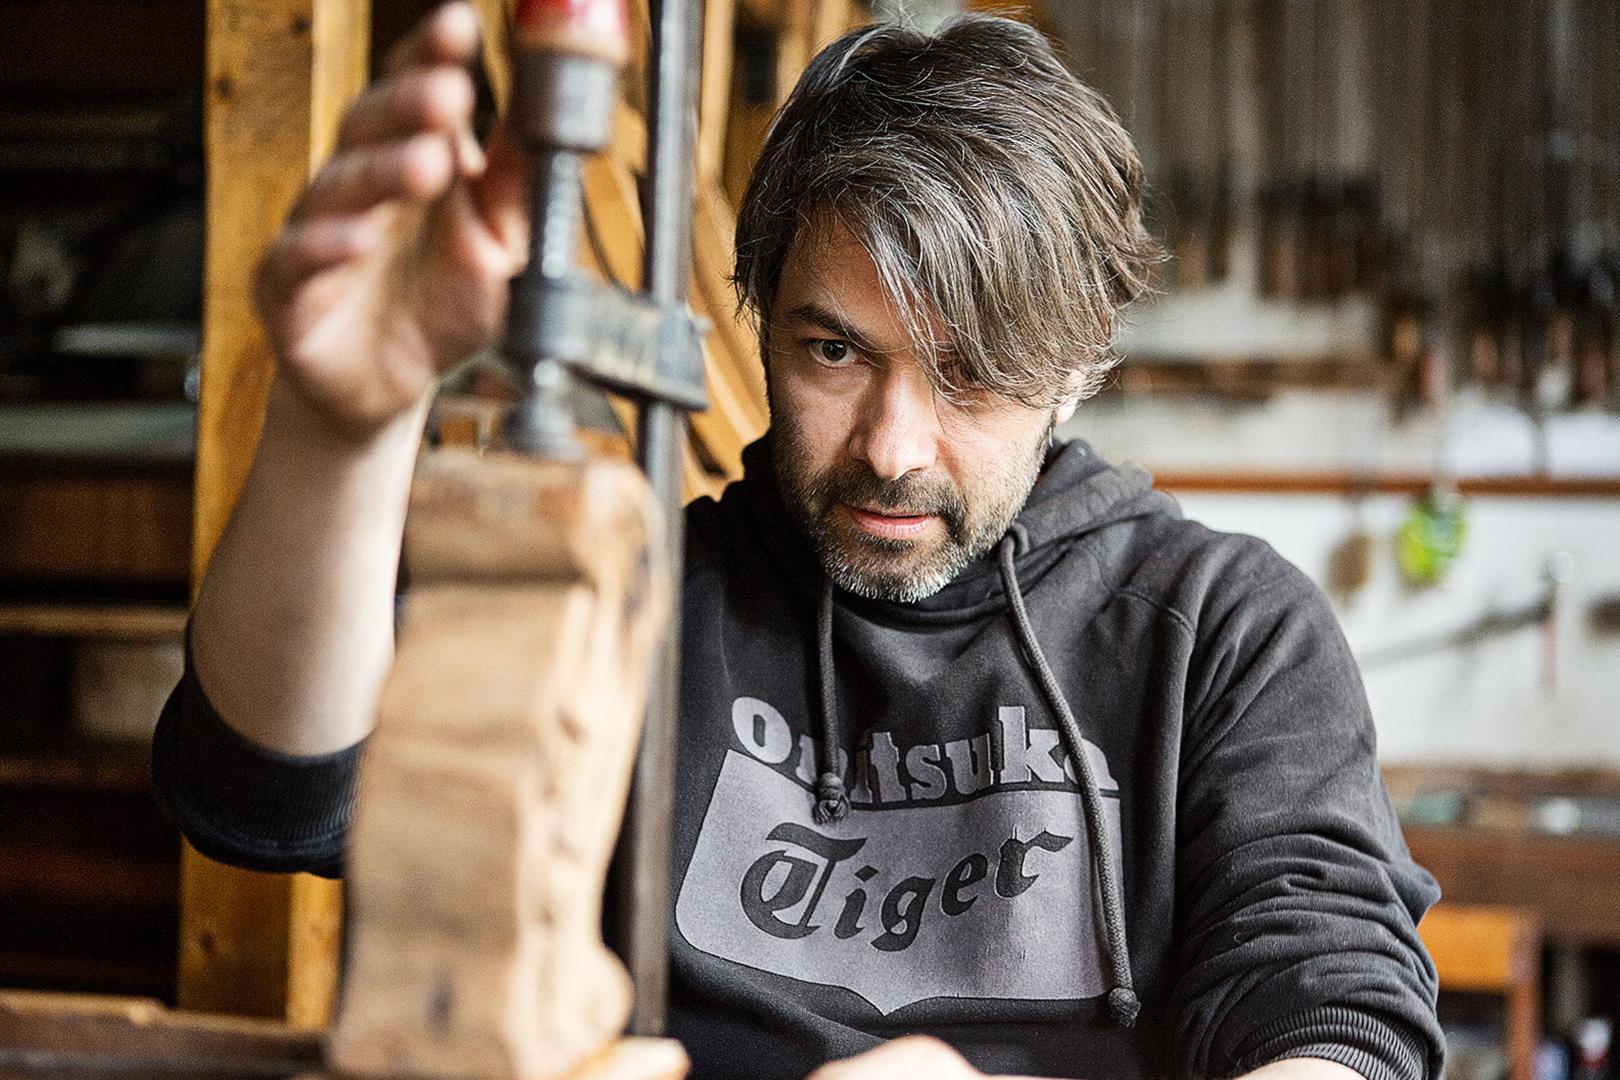 Reportage-portrait-eines-berliner-restaurators